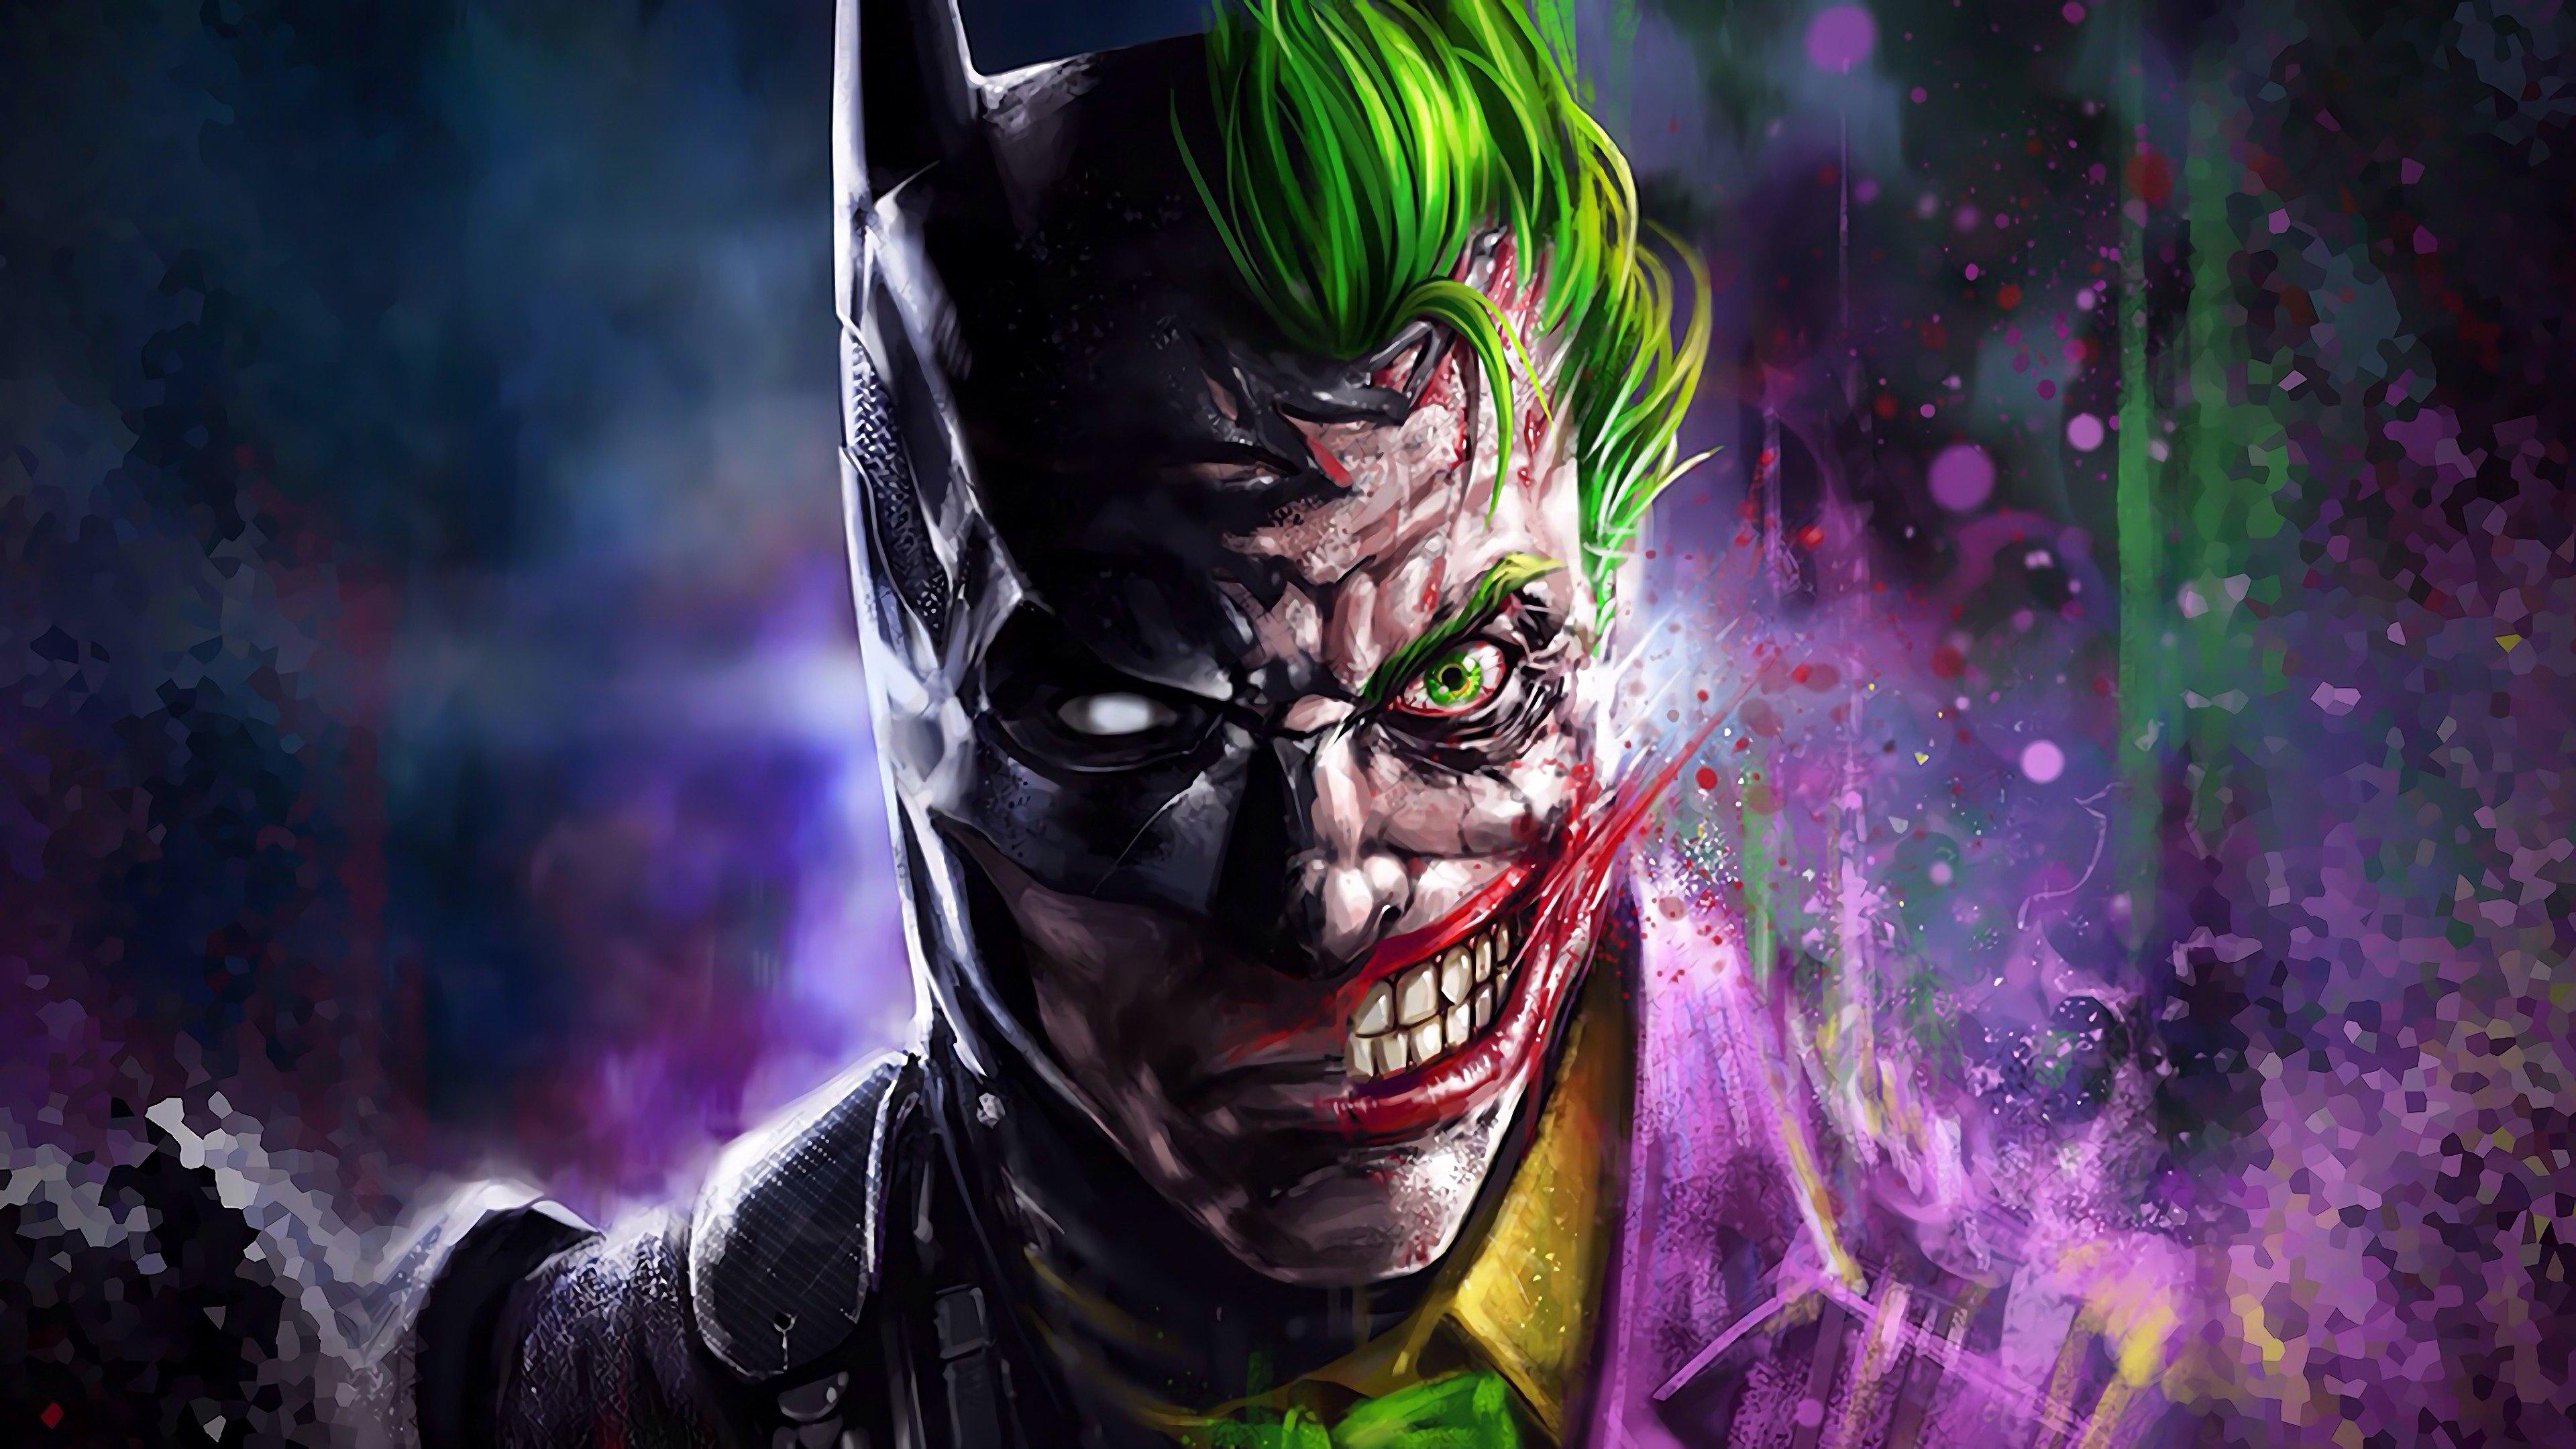 Fondos de pantalla Batman y Guasón